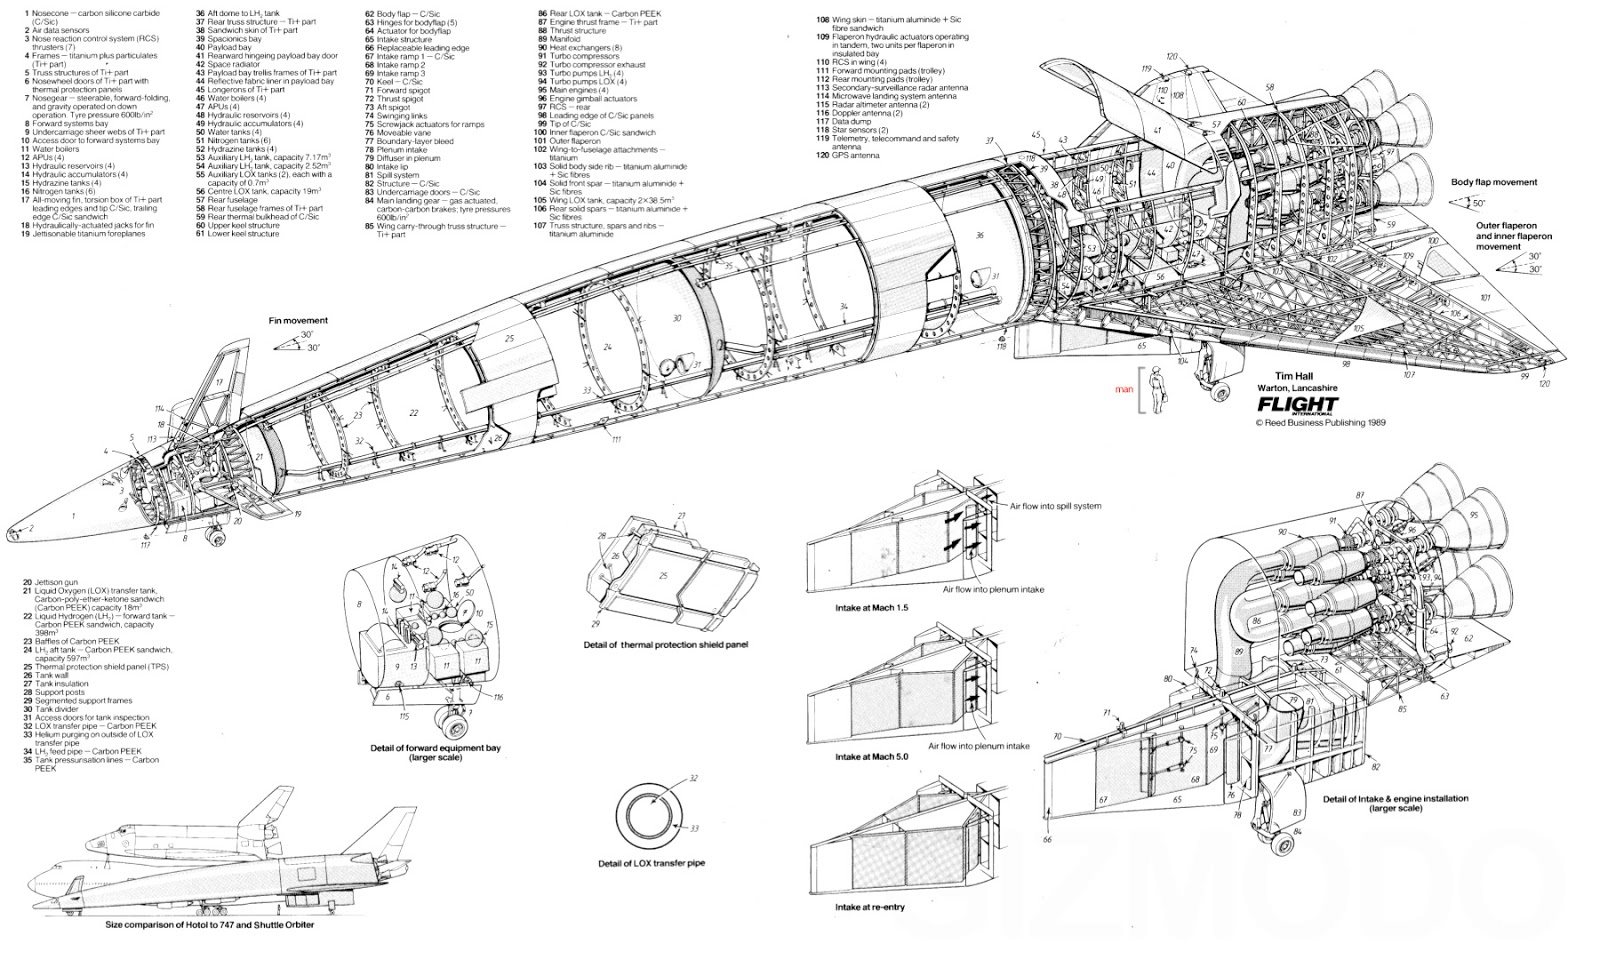 1966 Mustang Ignition Wiring Diagram On 3 1 Pushrod Engine Diagram